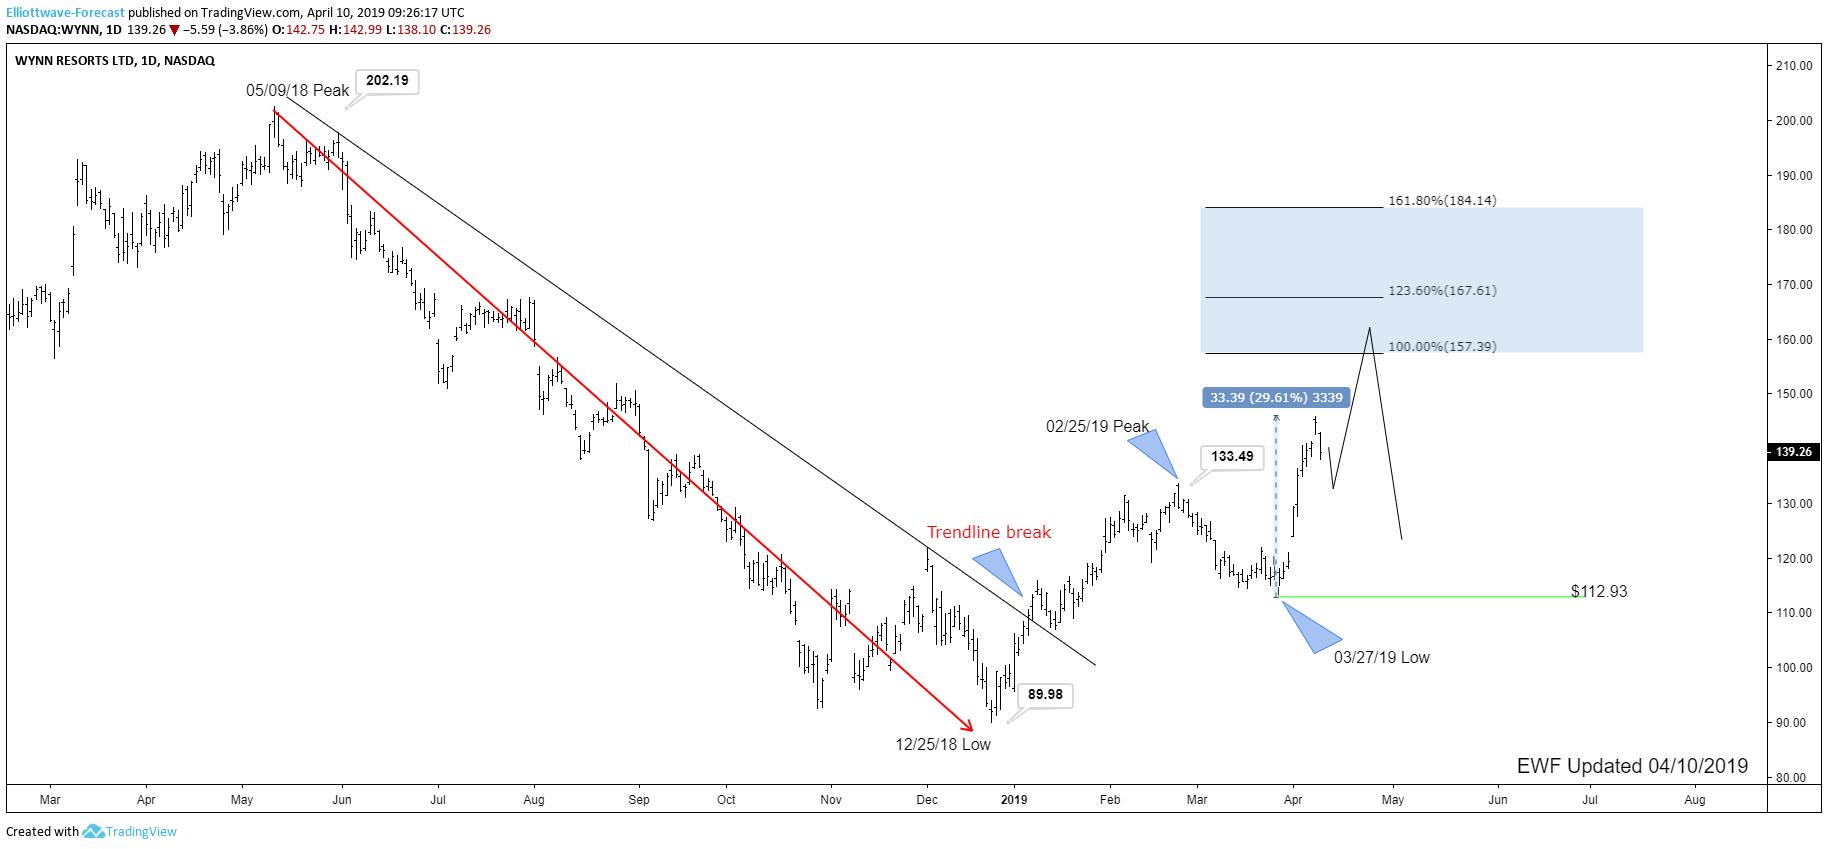 WYNN Resorts Ltd. stock soaring Higher, Can It Continue?